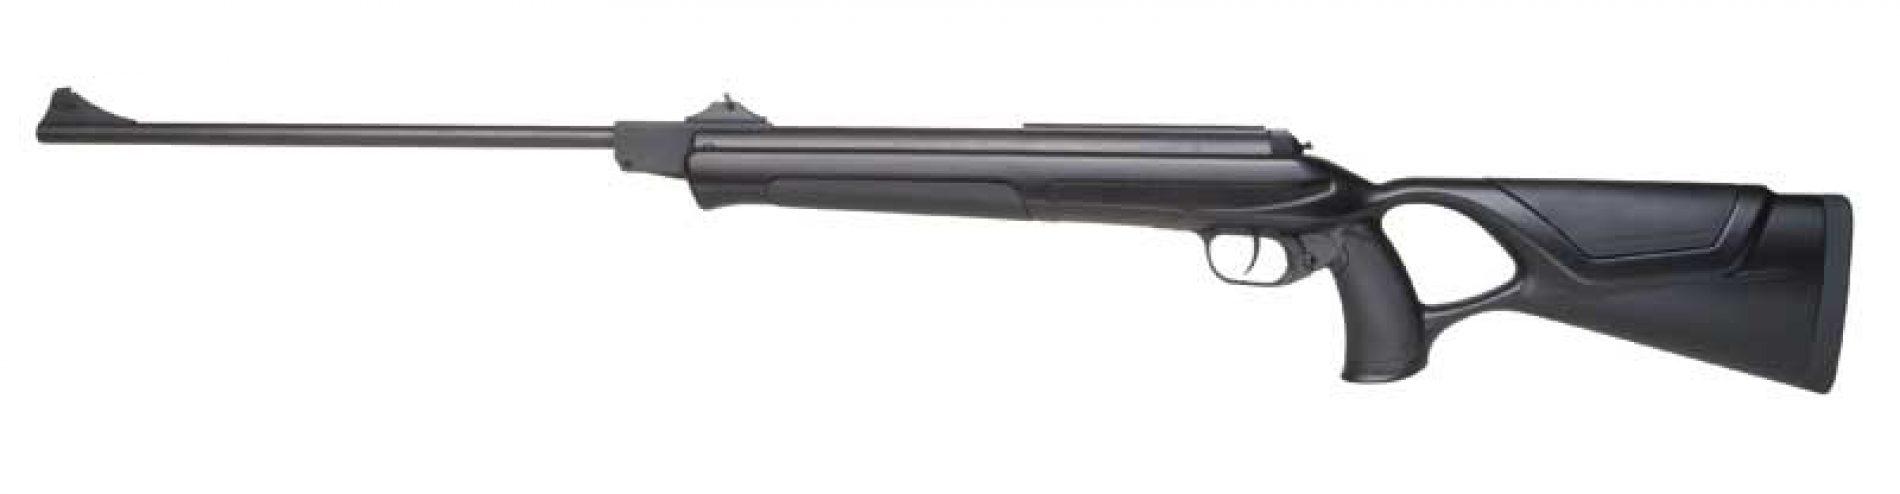 Carabina Blaser AR8 Professional Success, aire comprimido de diseño